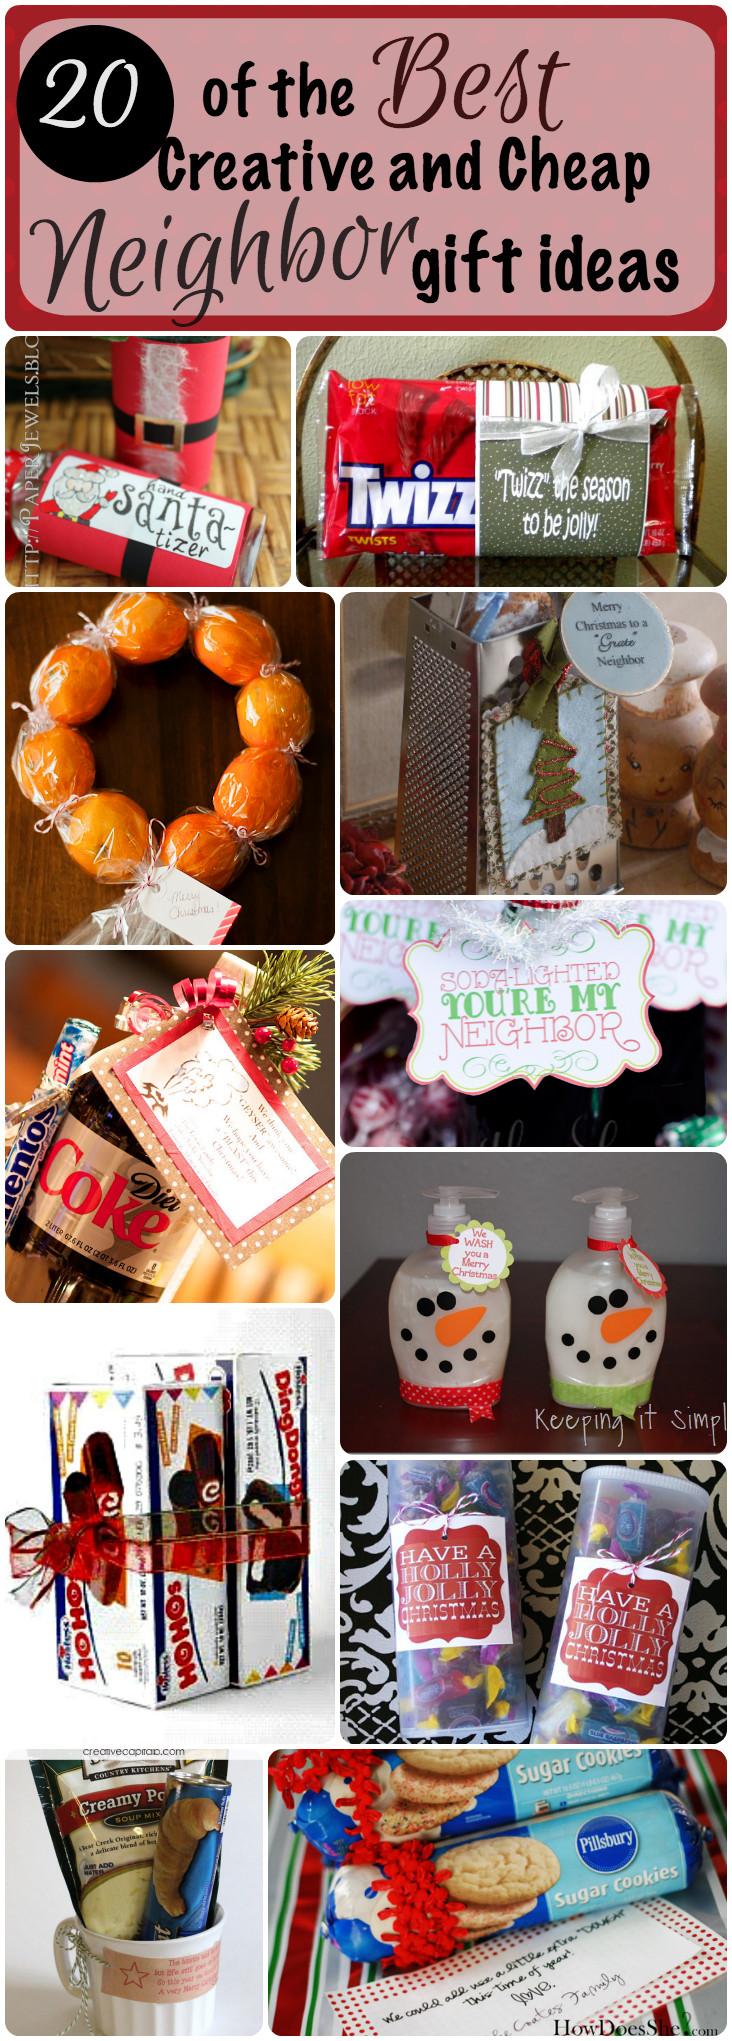 Neighbors Gift Ideas For Christmas  20 of the Best Creative and Cheap Neighbor Gifts for Christmas